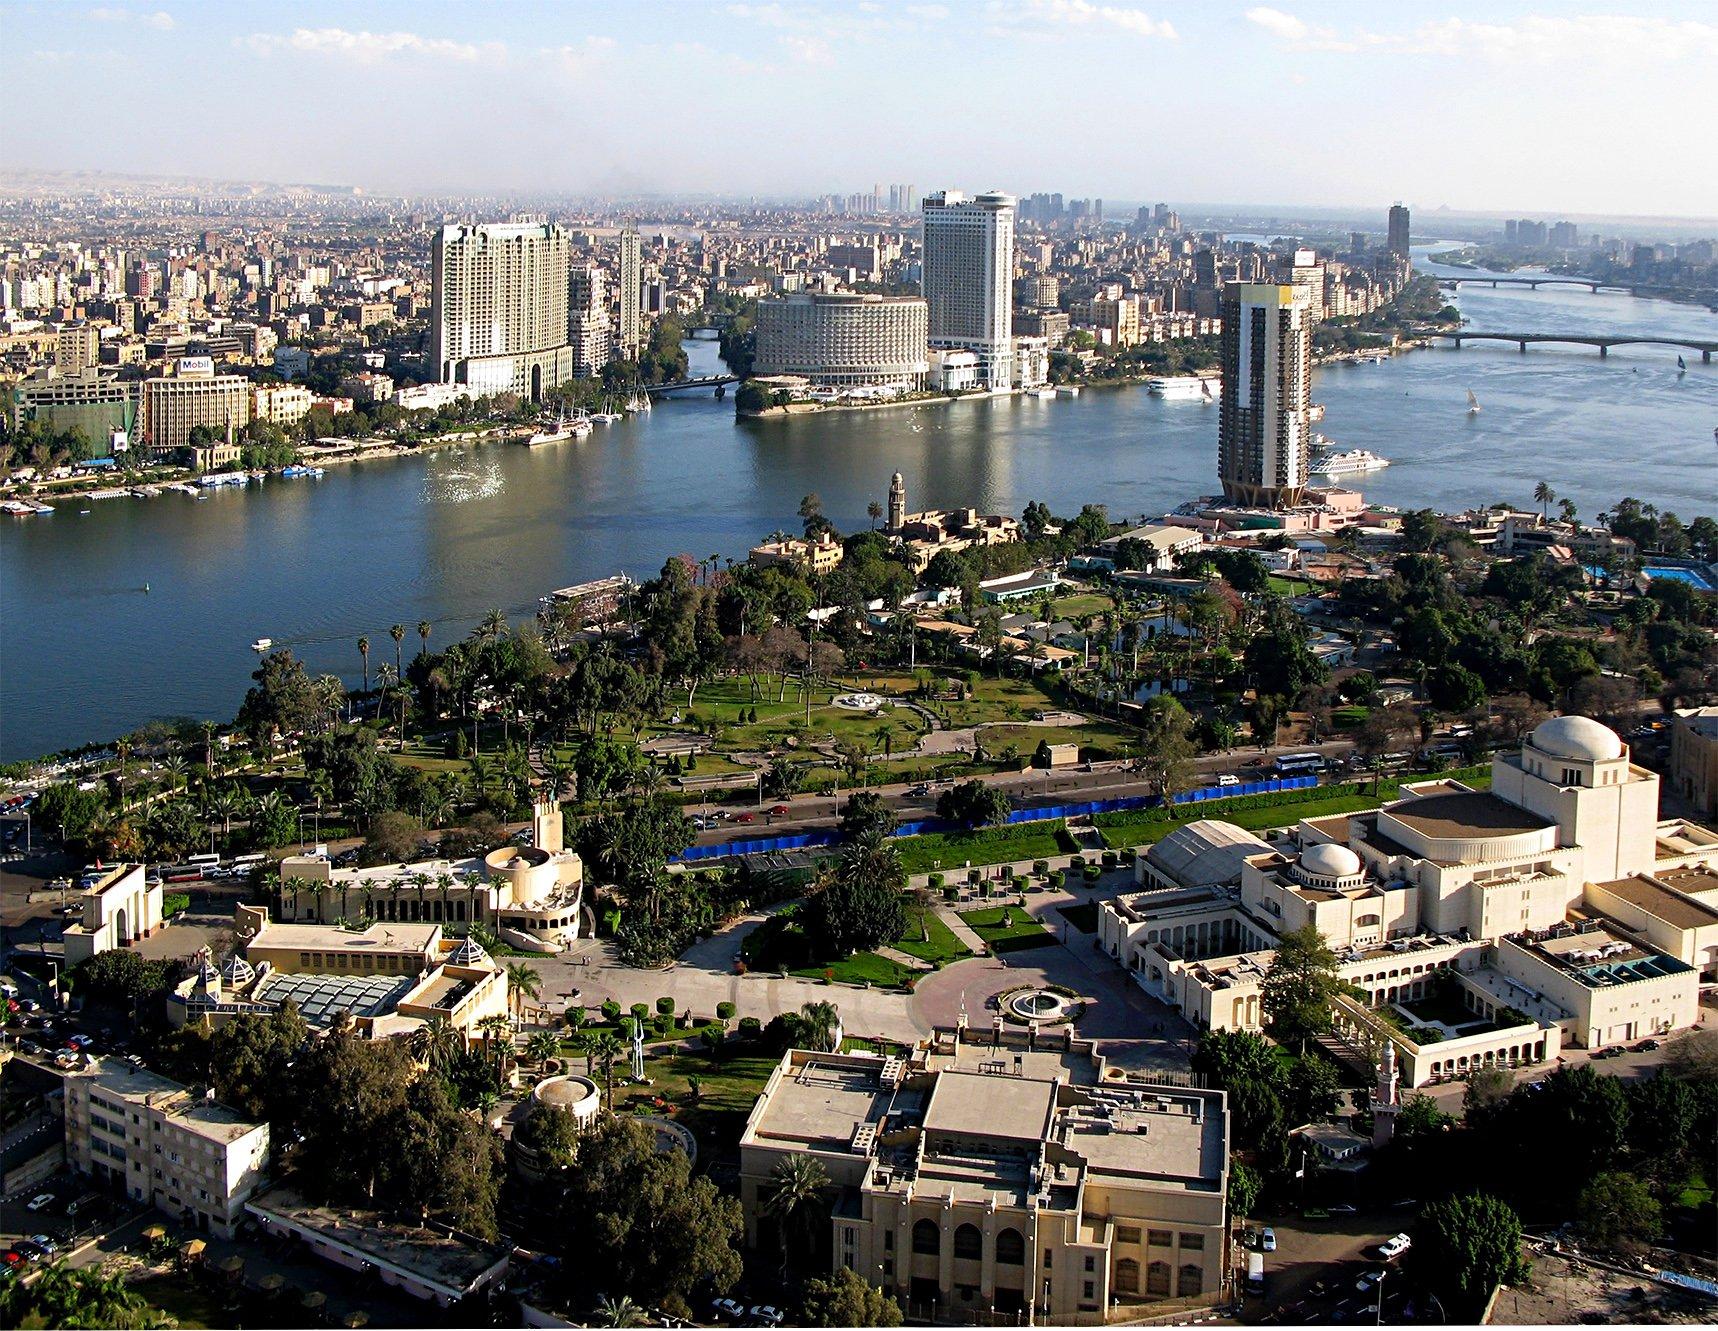 Nile River in Africa